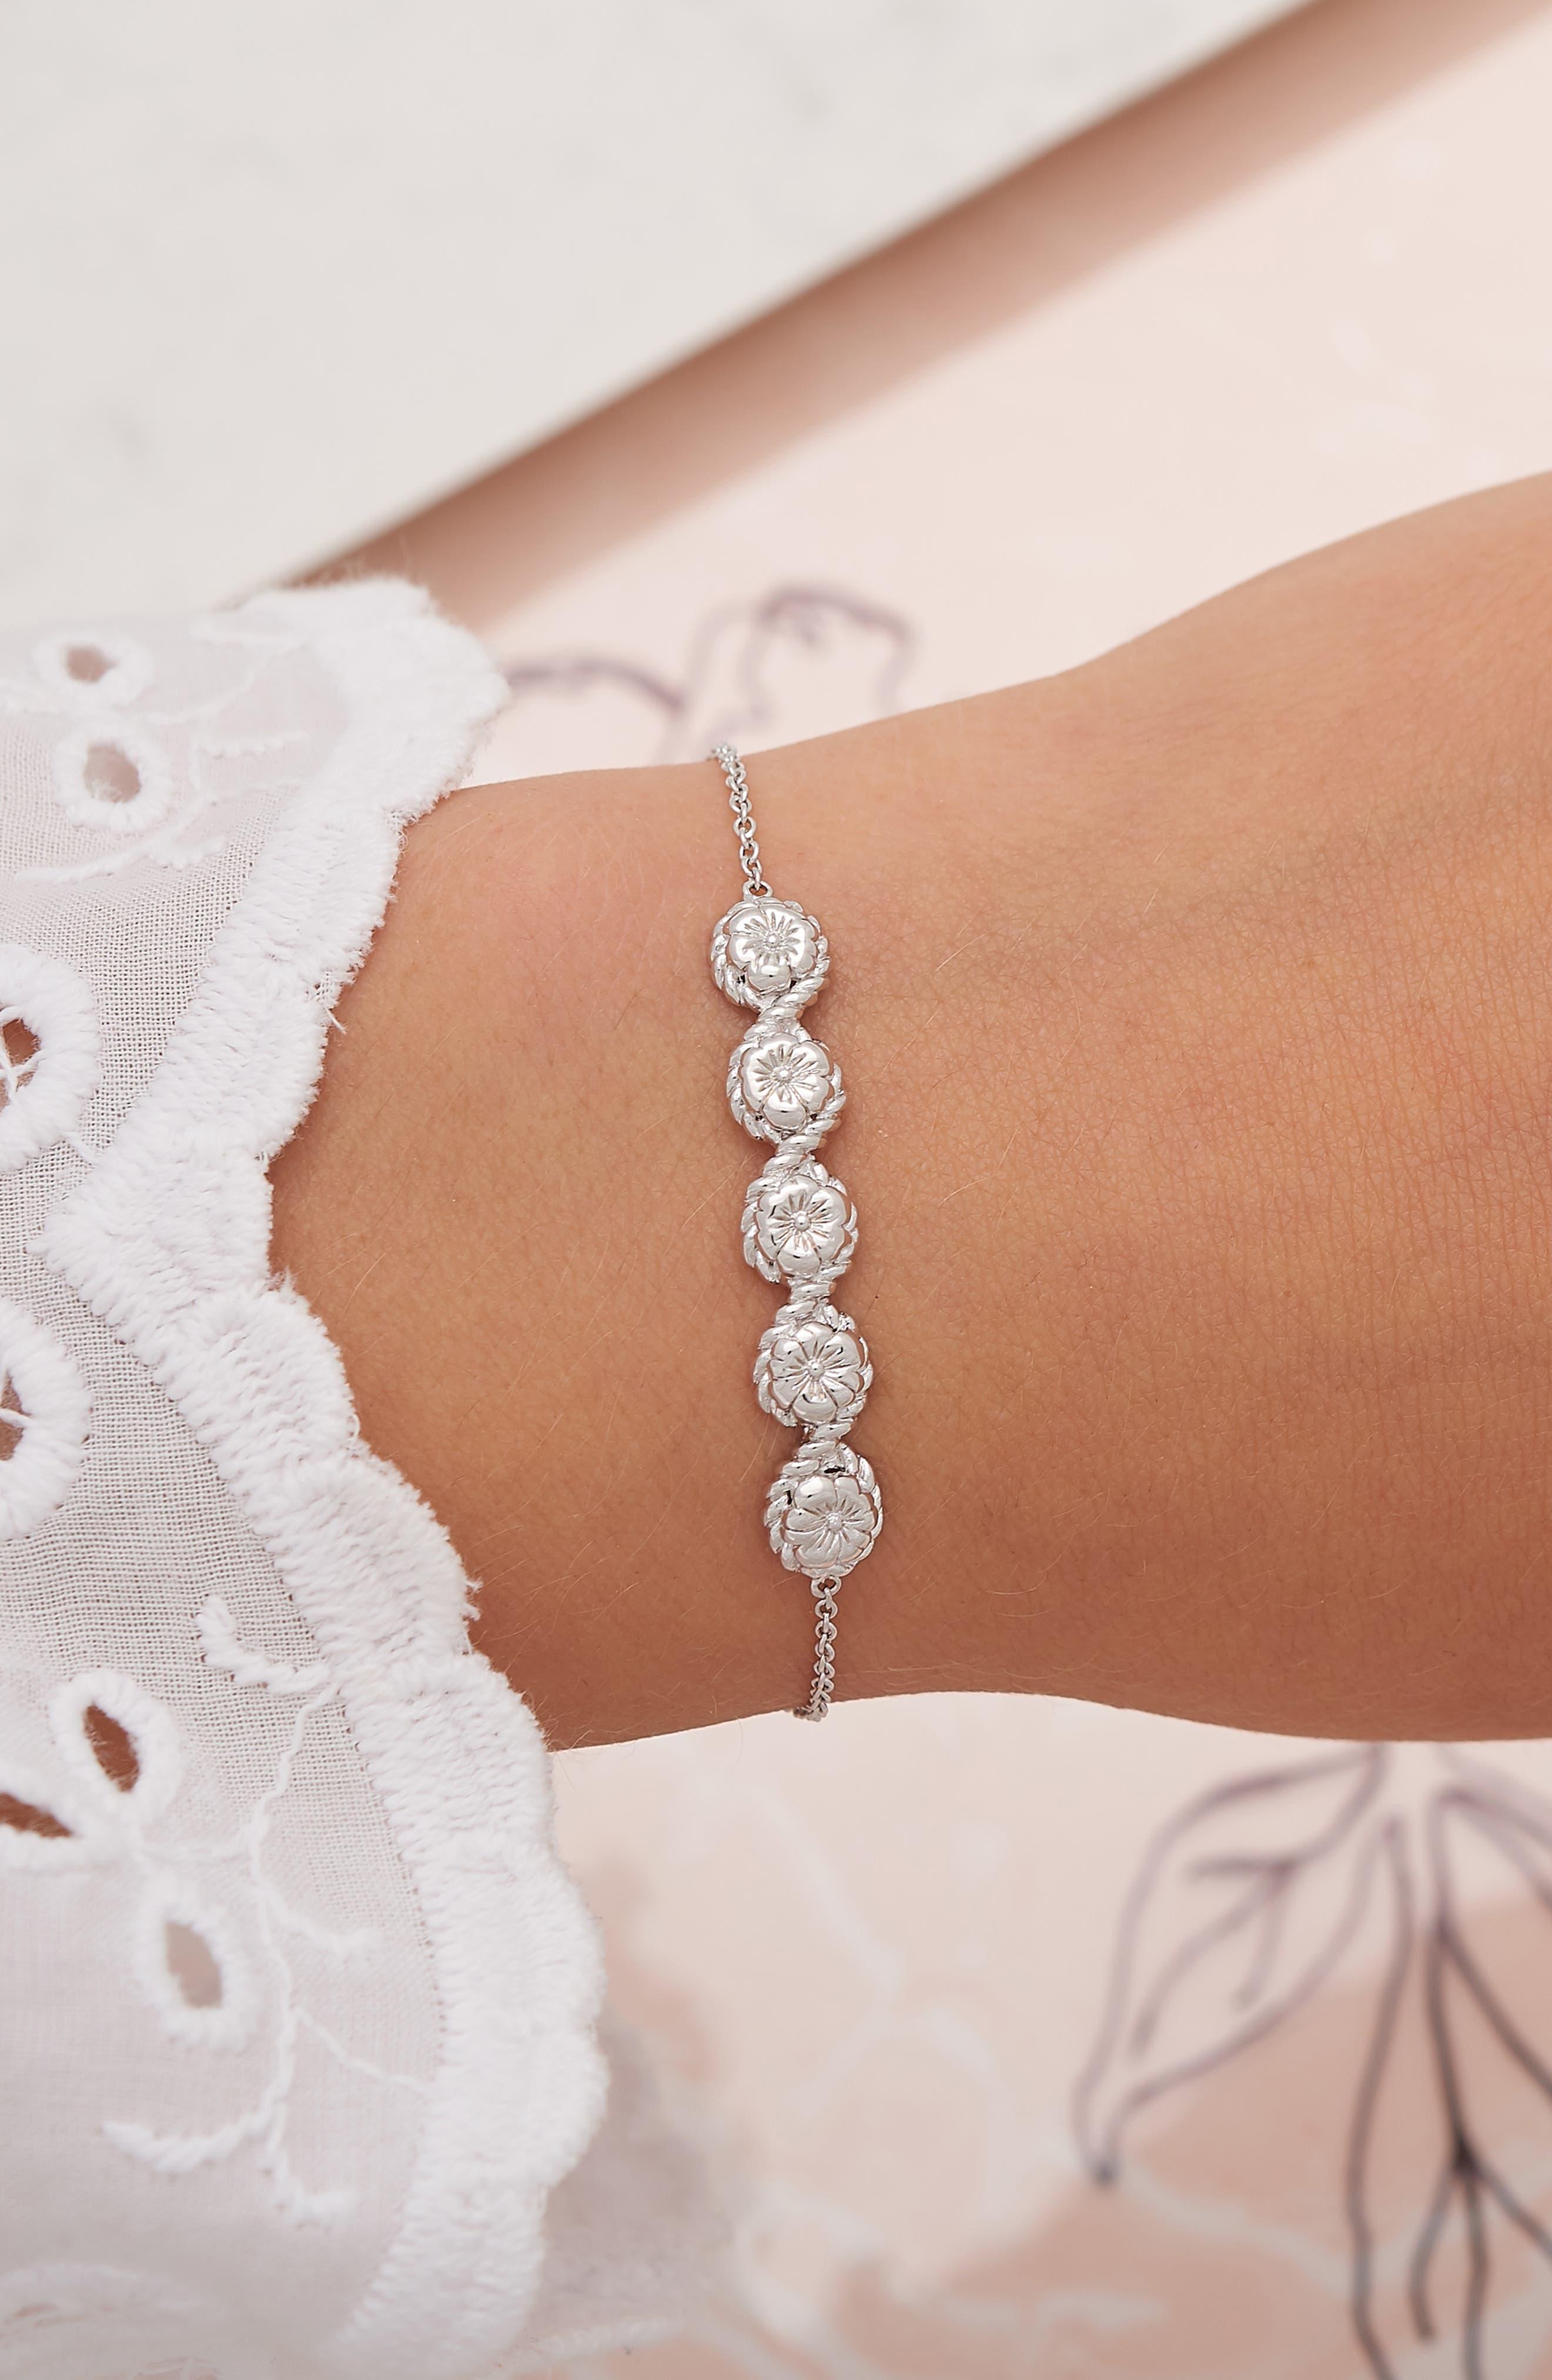 Flower Show Rope Chain Bracelet,                             Alternate thumbnail 2, color,                             SILVER